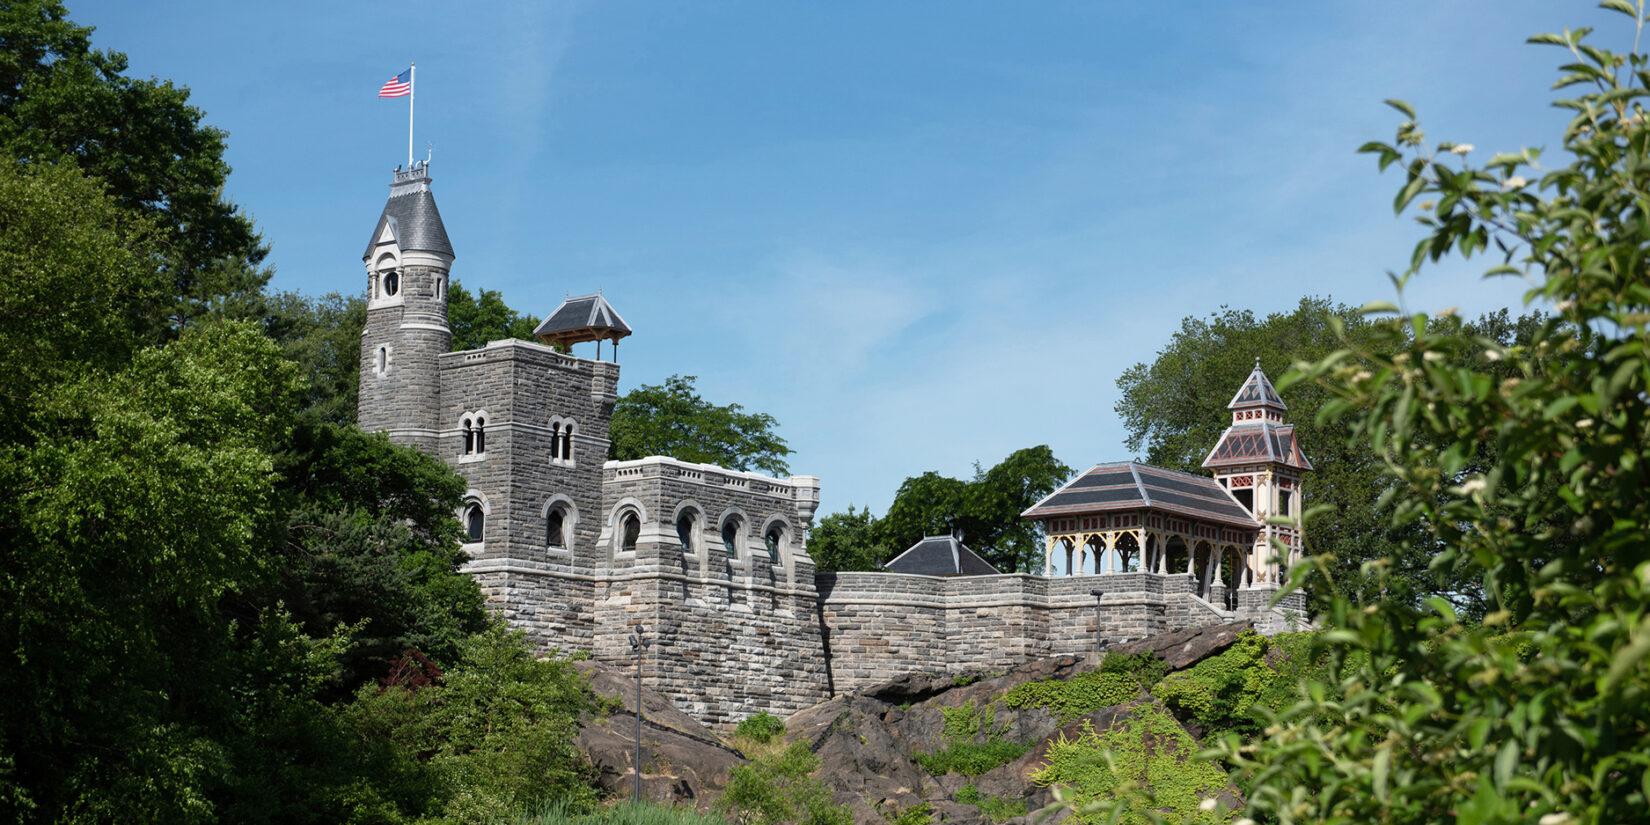 Belvedere restoration 2019